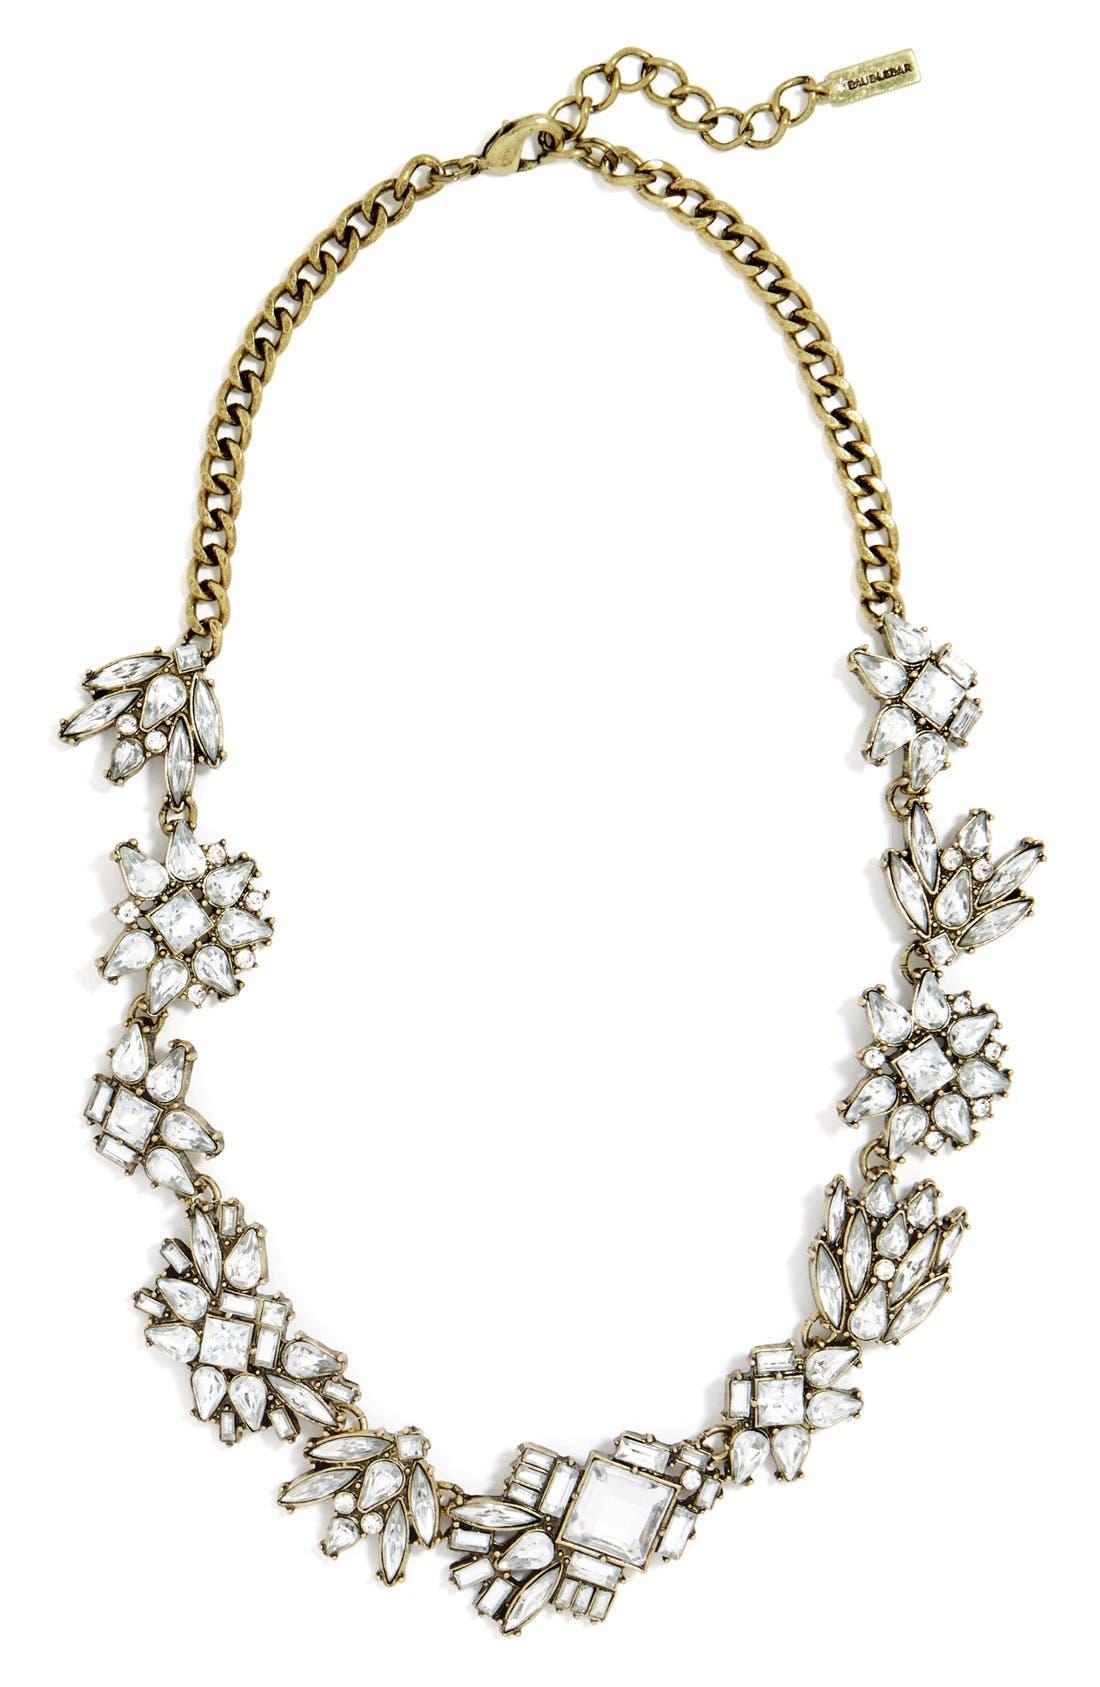 Main Image - BaubleBar 'Helsinki' Crystal Collar Necklace